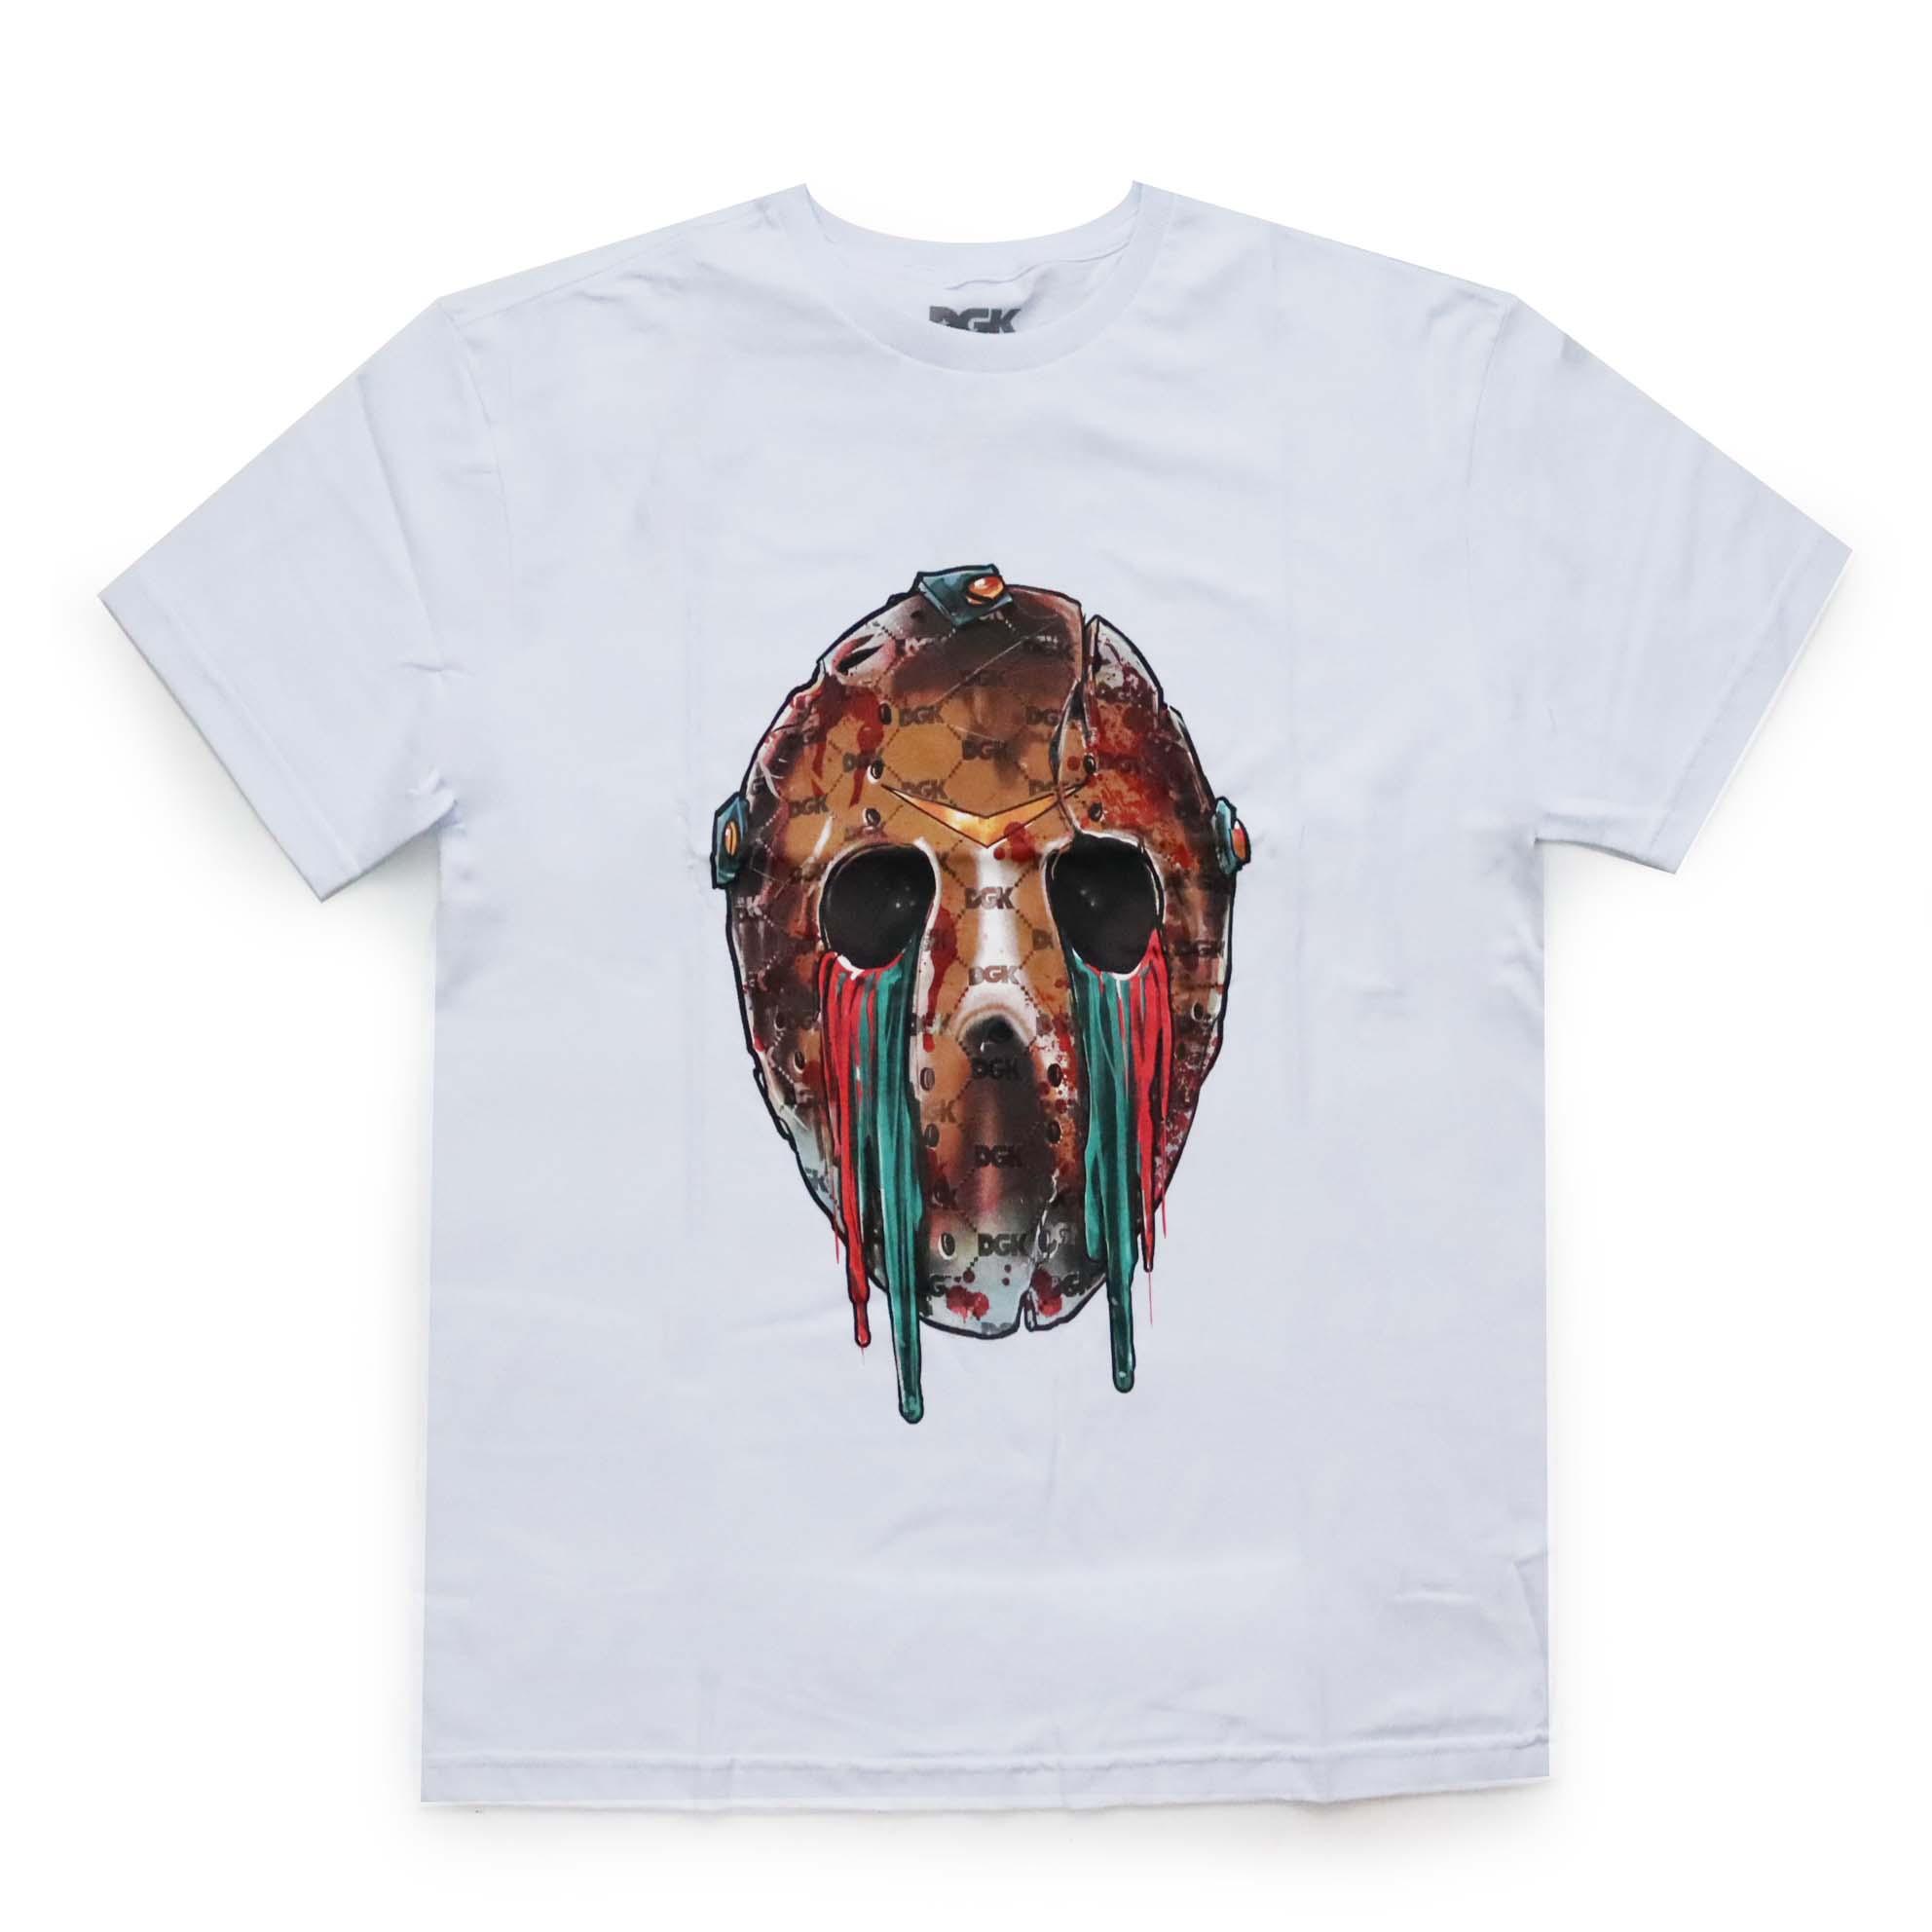 Camiseta DGK Hooligan - Branco